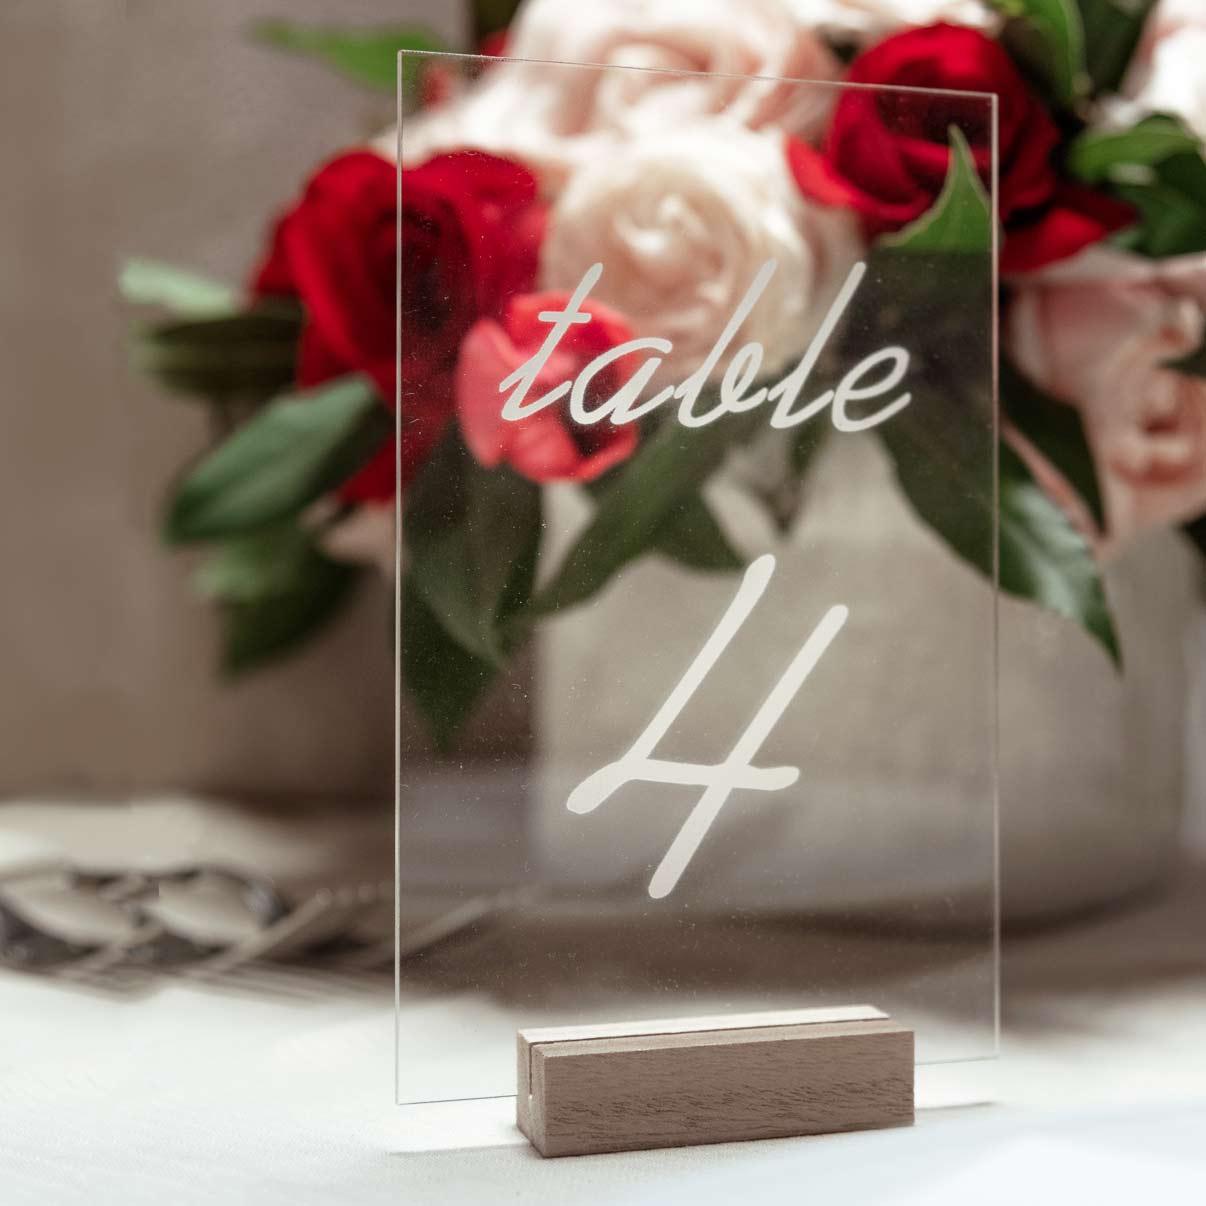 Allestimento-matrimonio-plexiglass-menu-segnatavolo-plastica-trasparente-nozze-plexi-opaco-lucido